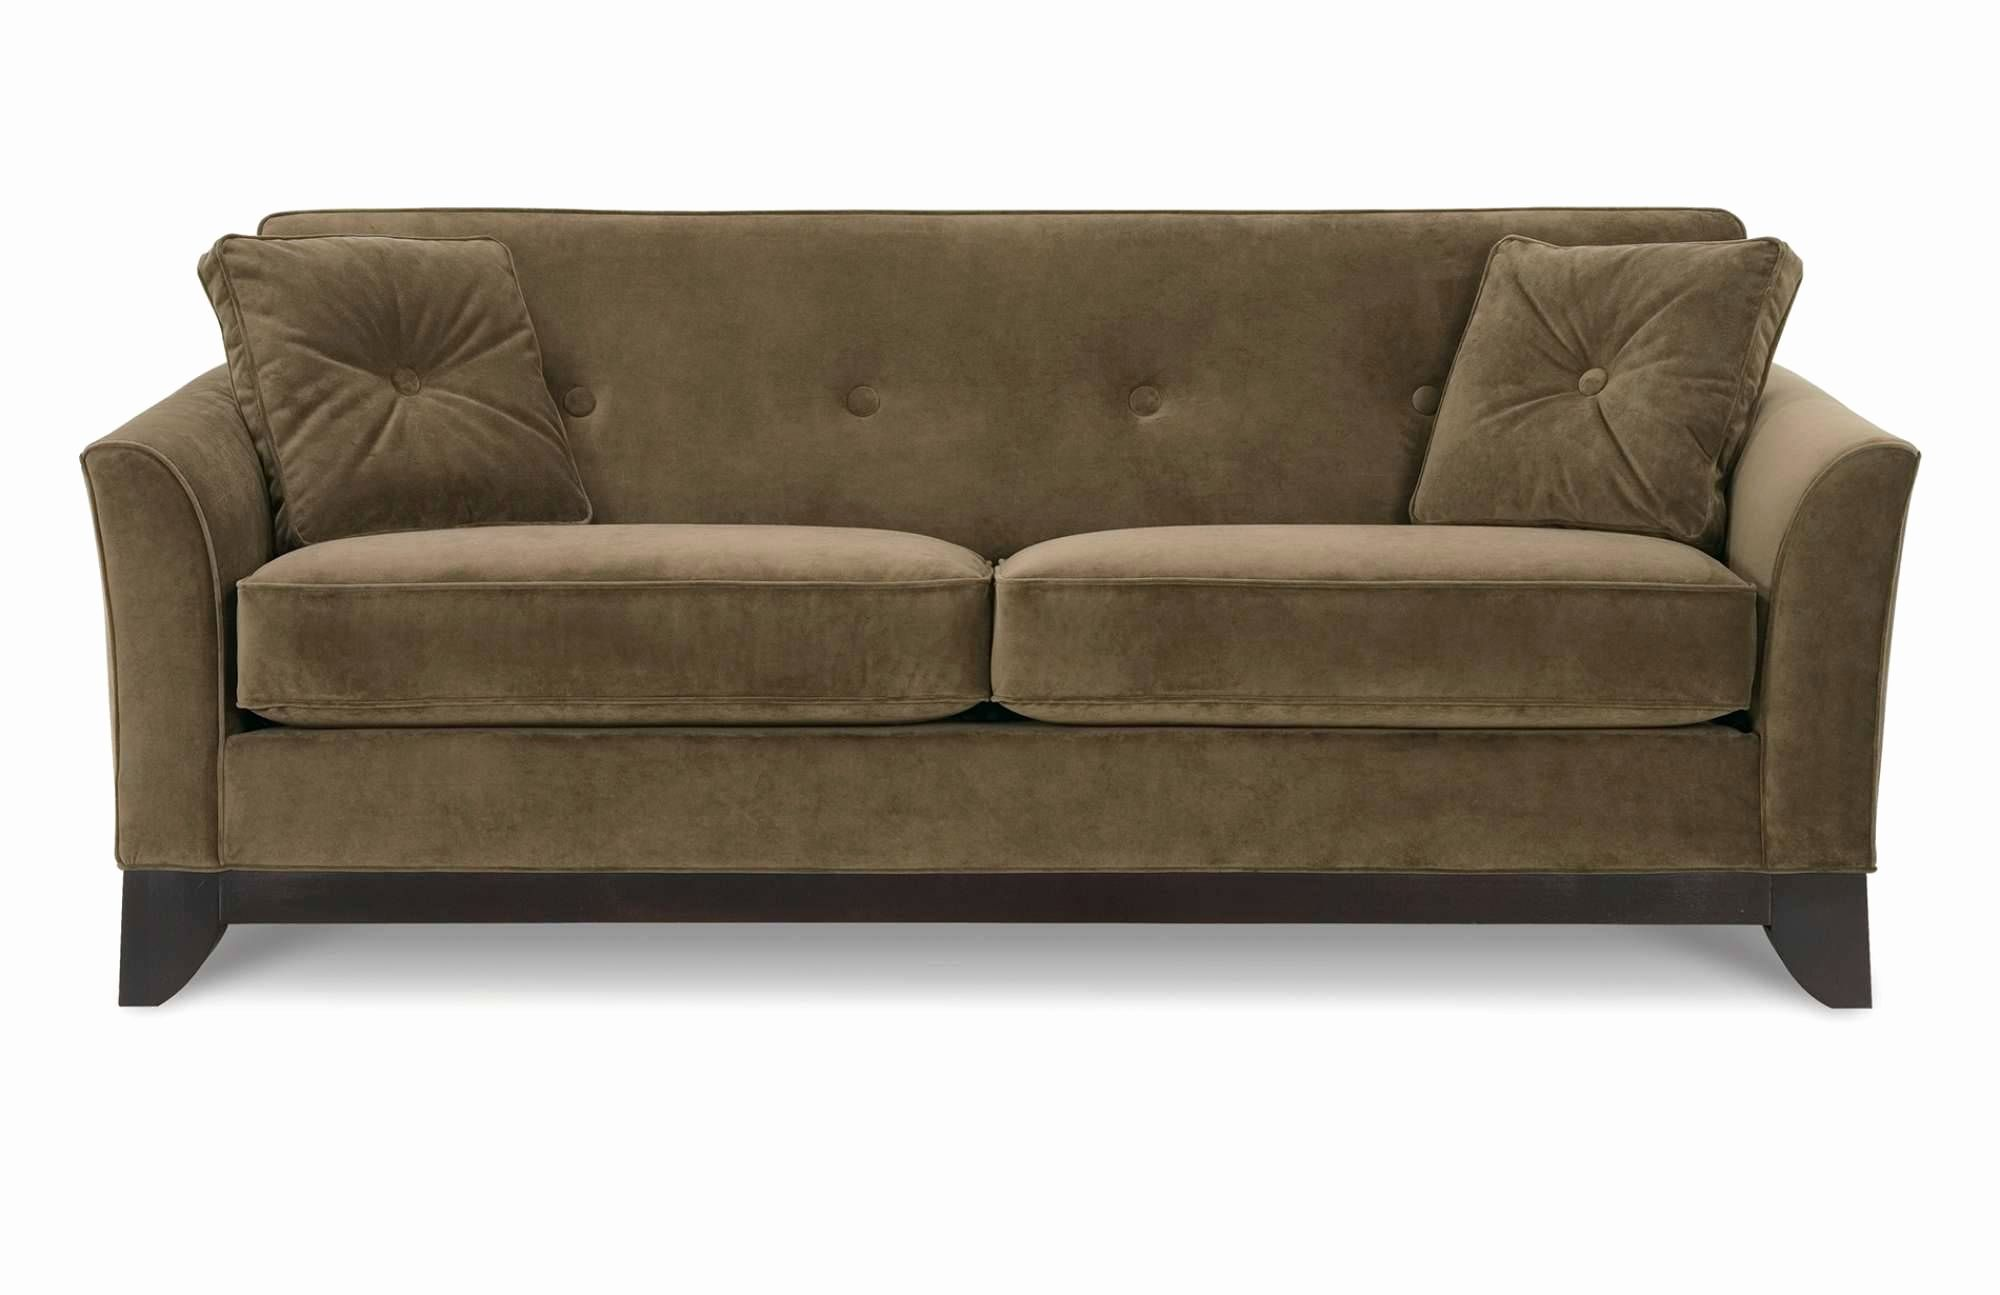 fancy sofa sets buy futon bed new set shot 2018 popular sofas